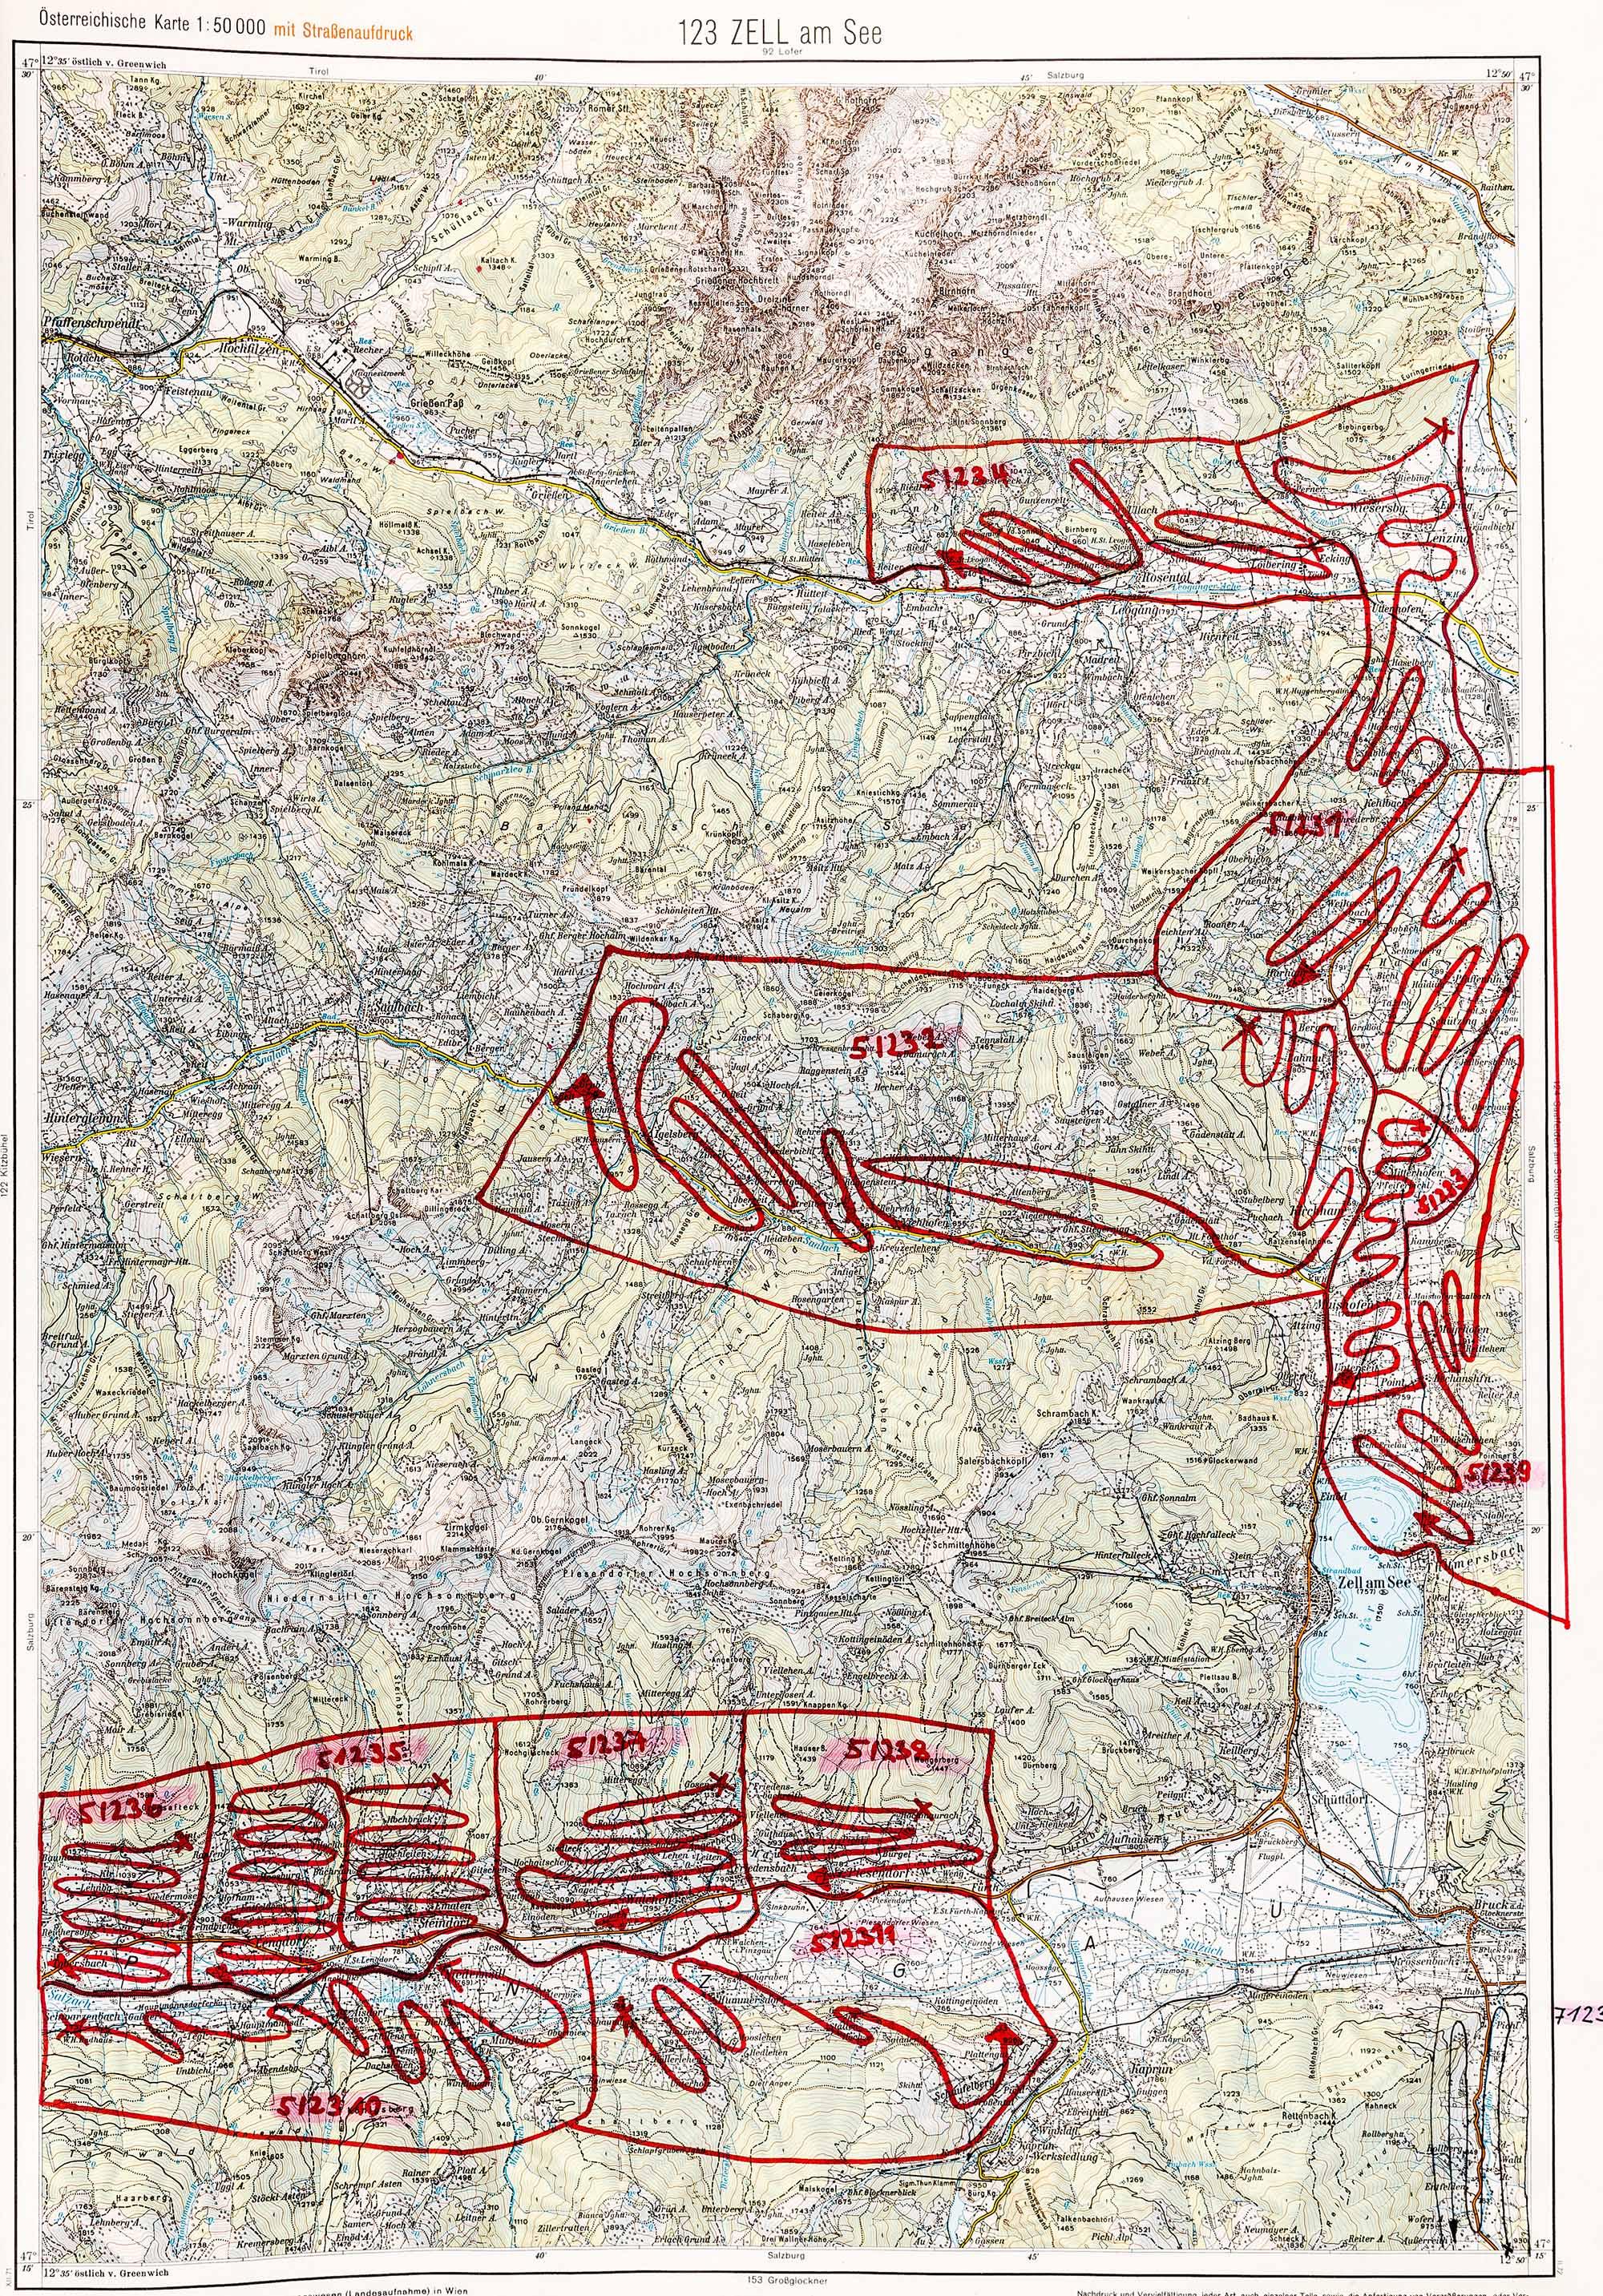 1975-1979 Karte 123